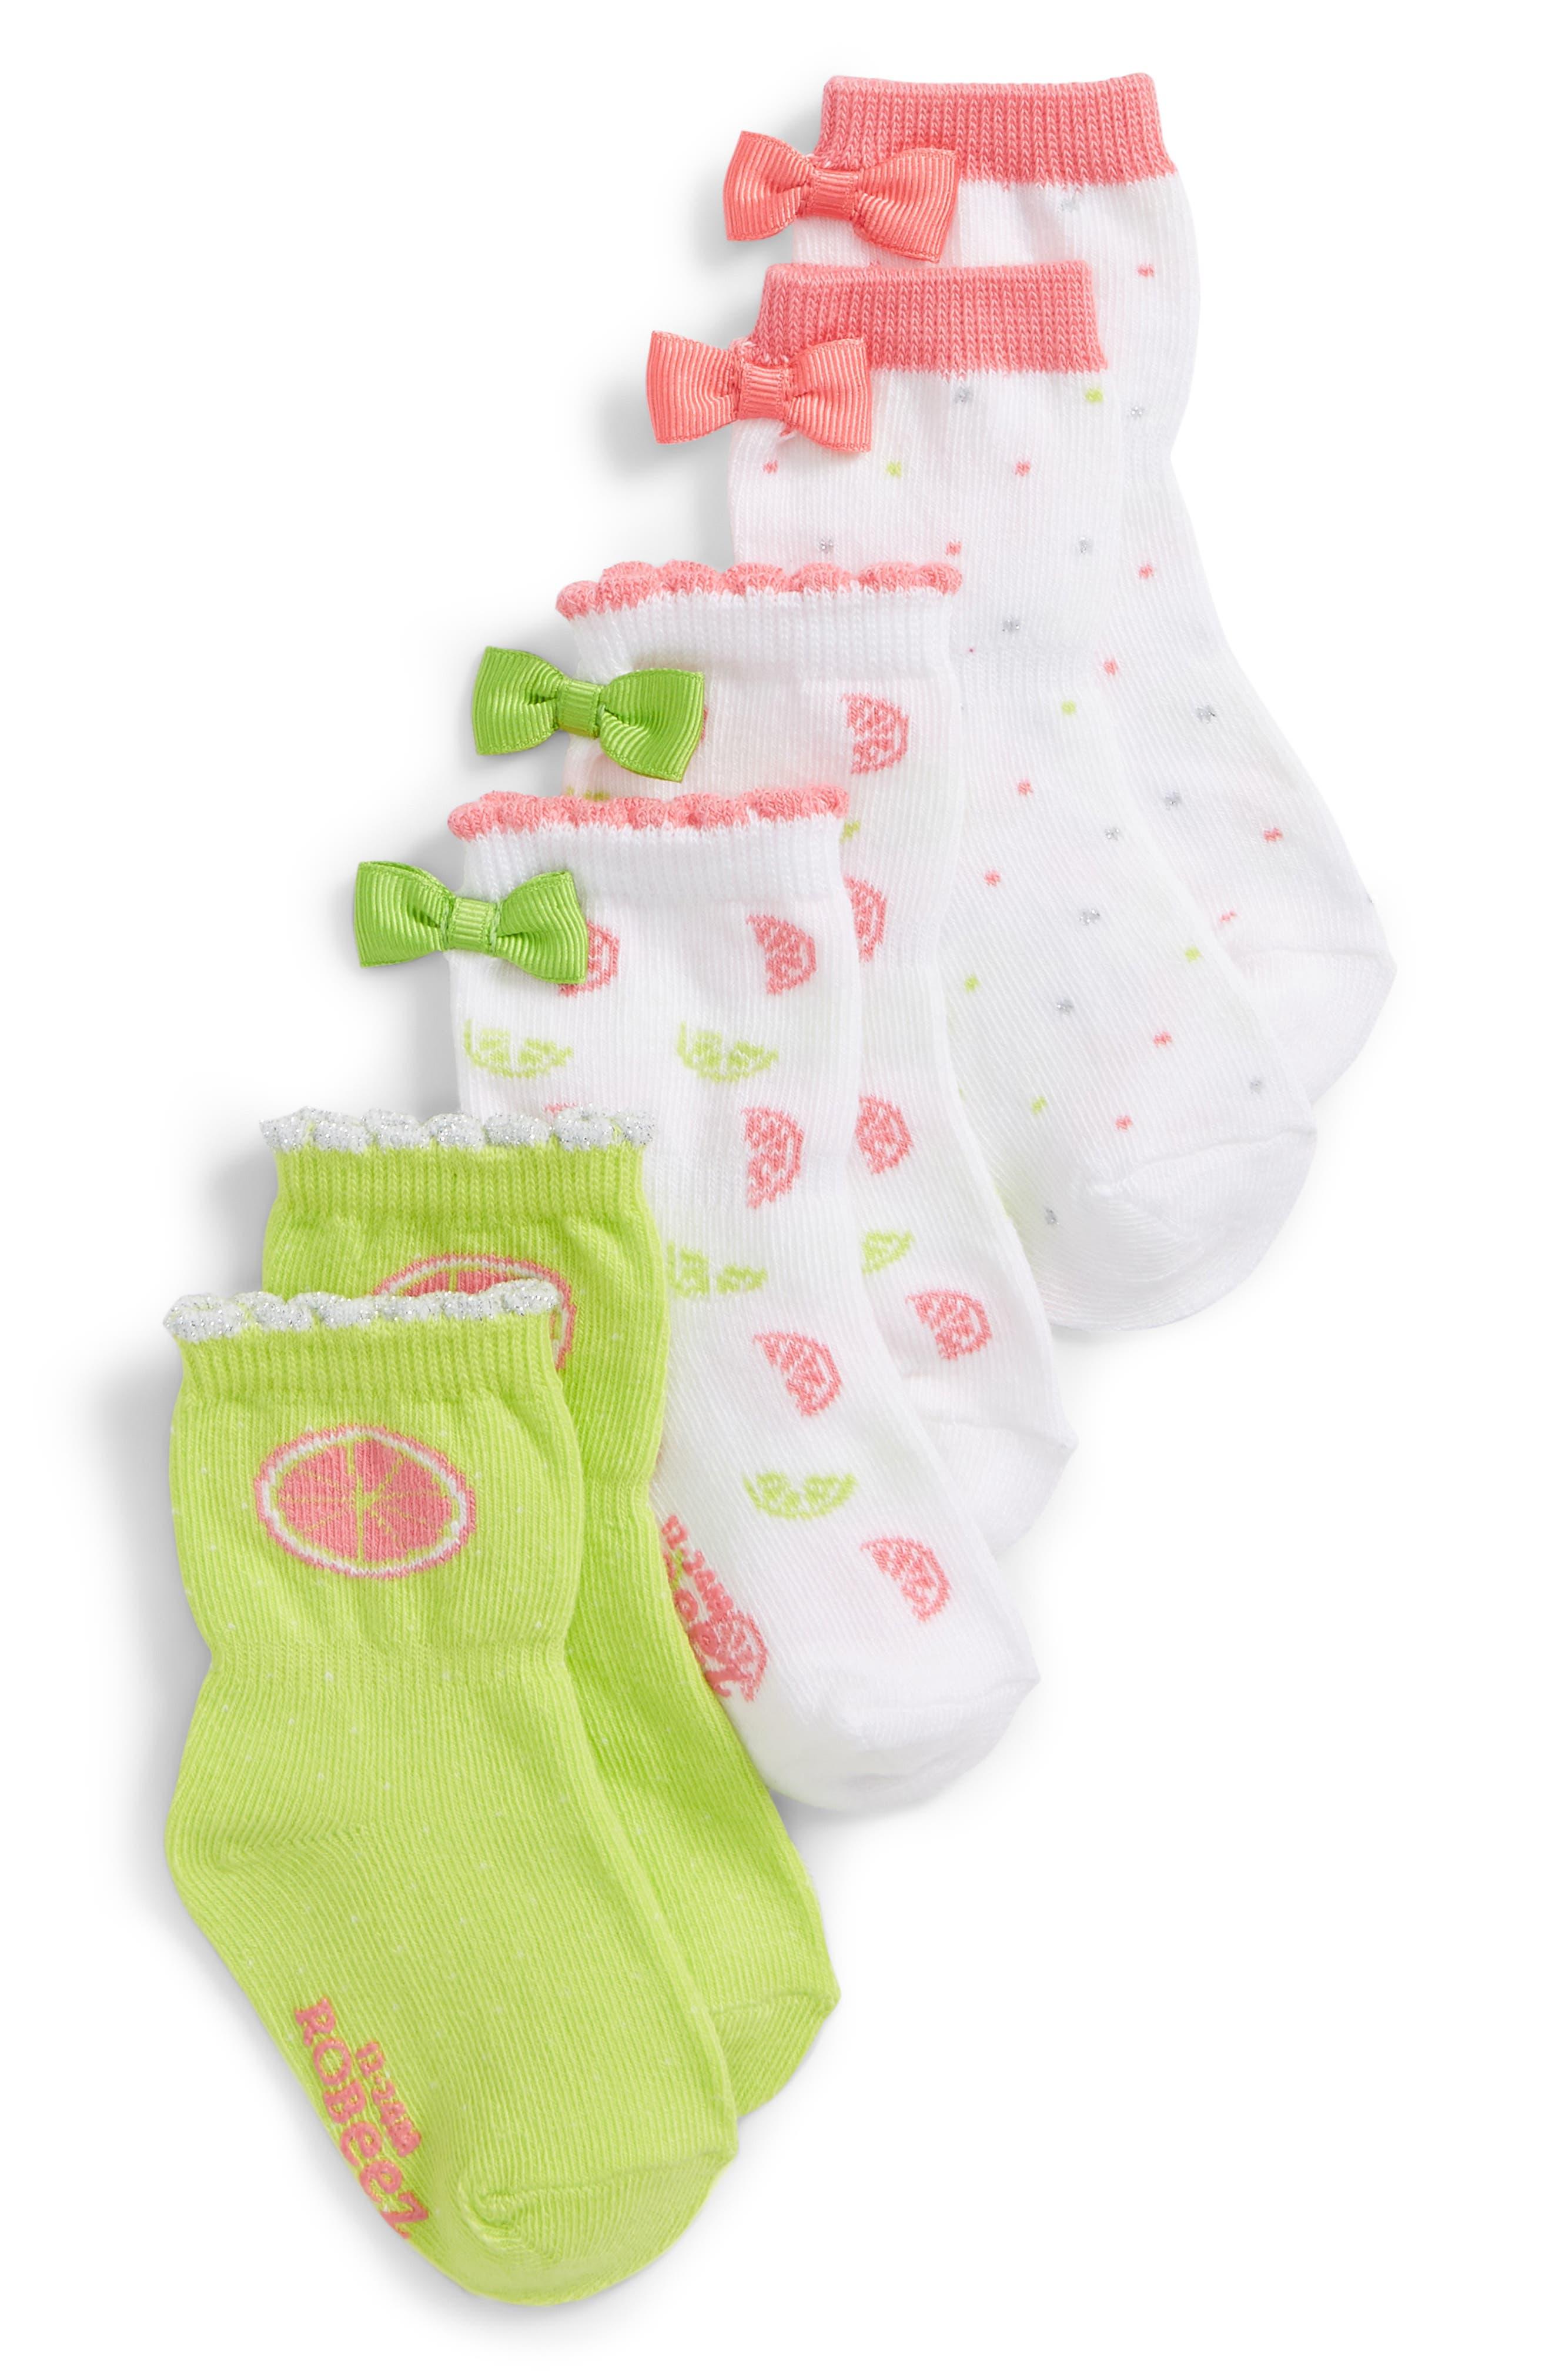 Toddler Girls Robeez Citrus 3Pack Socks Size 1224months  Green